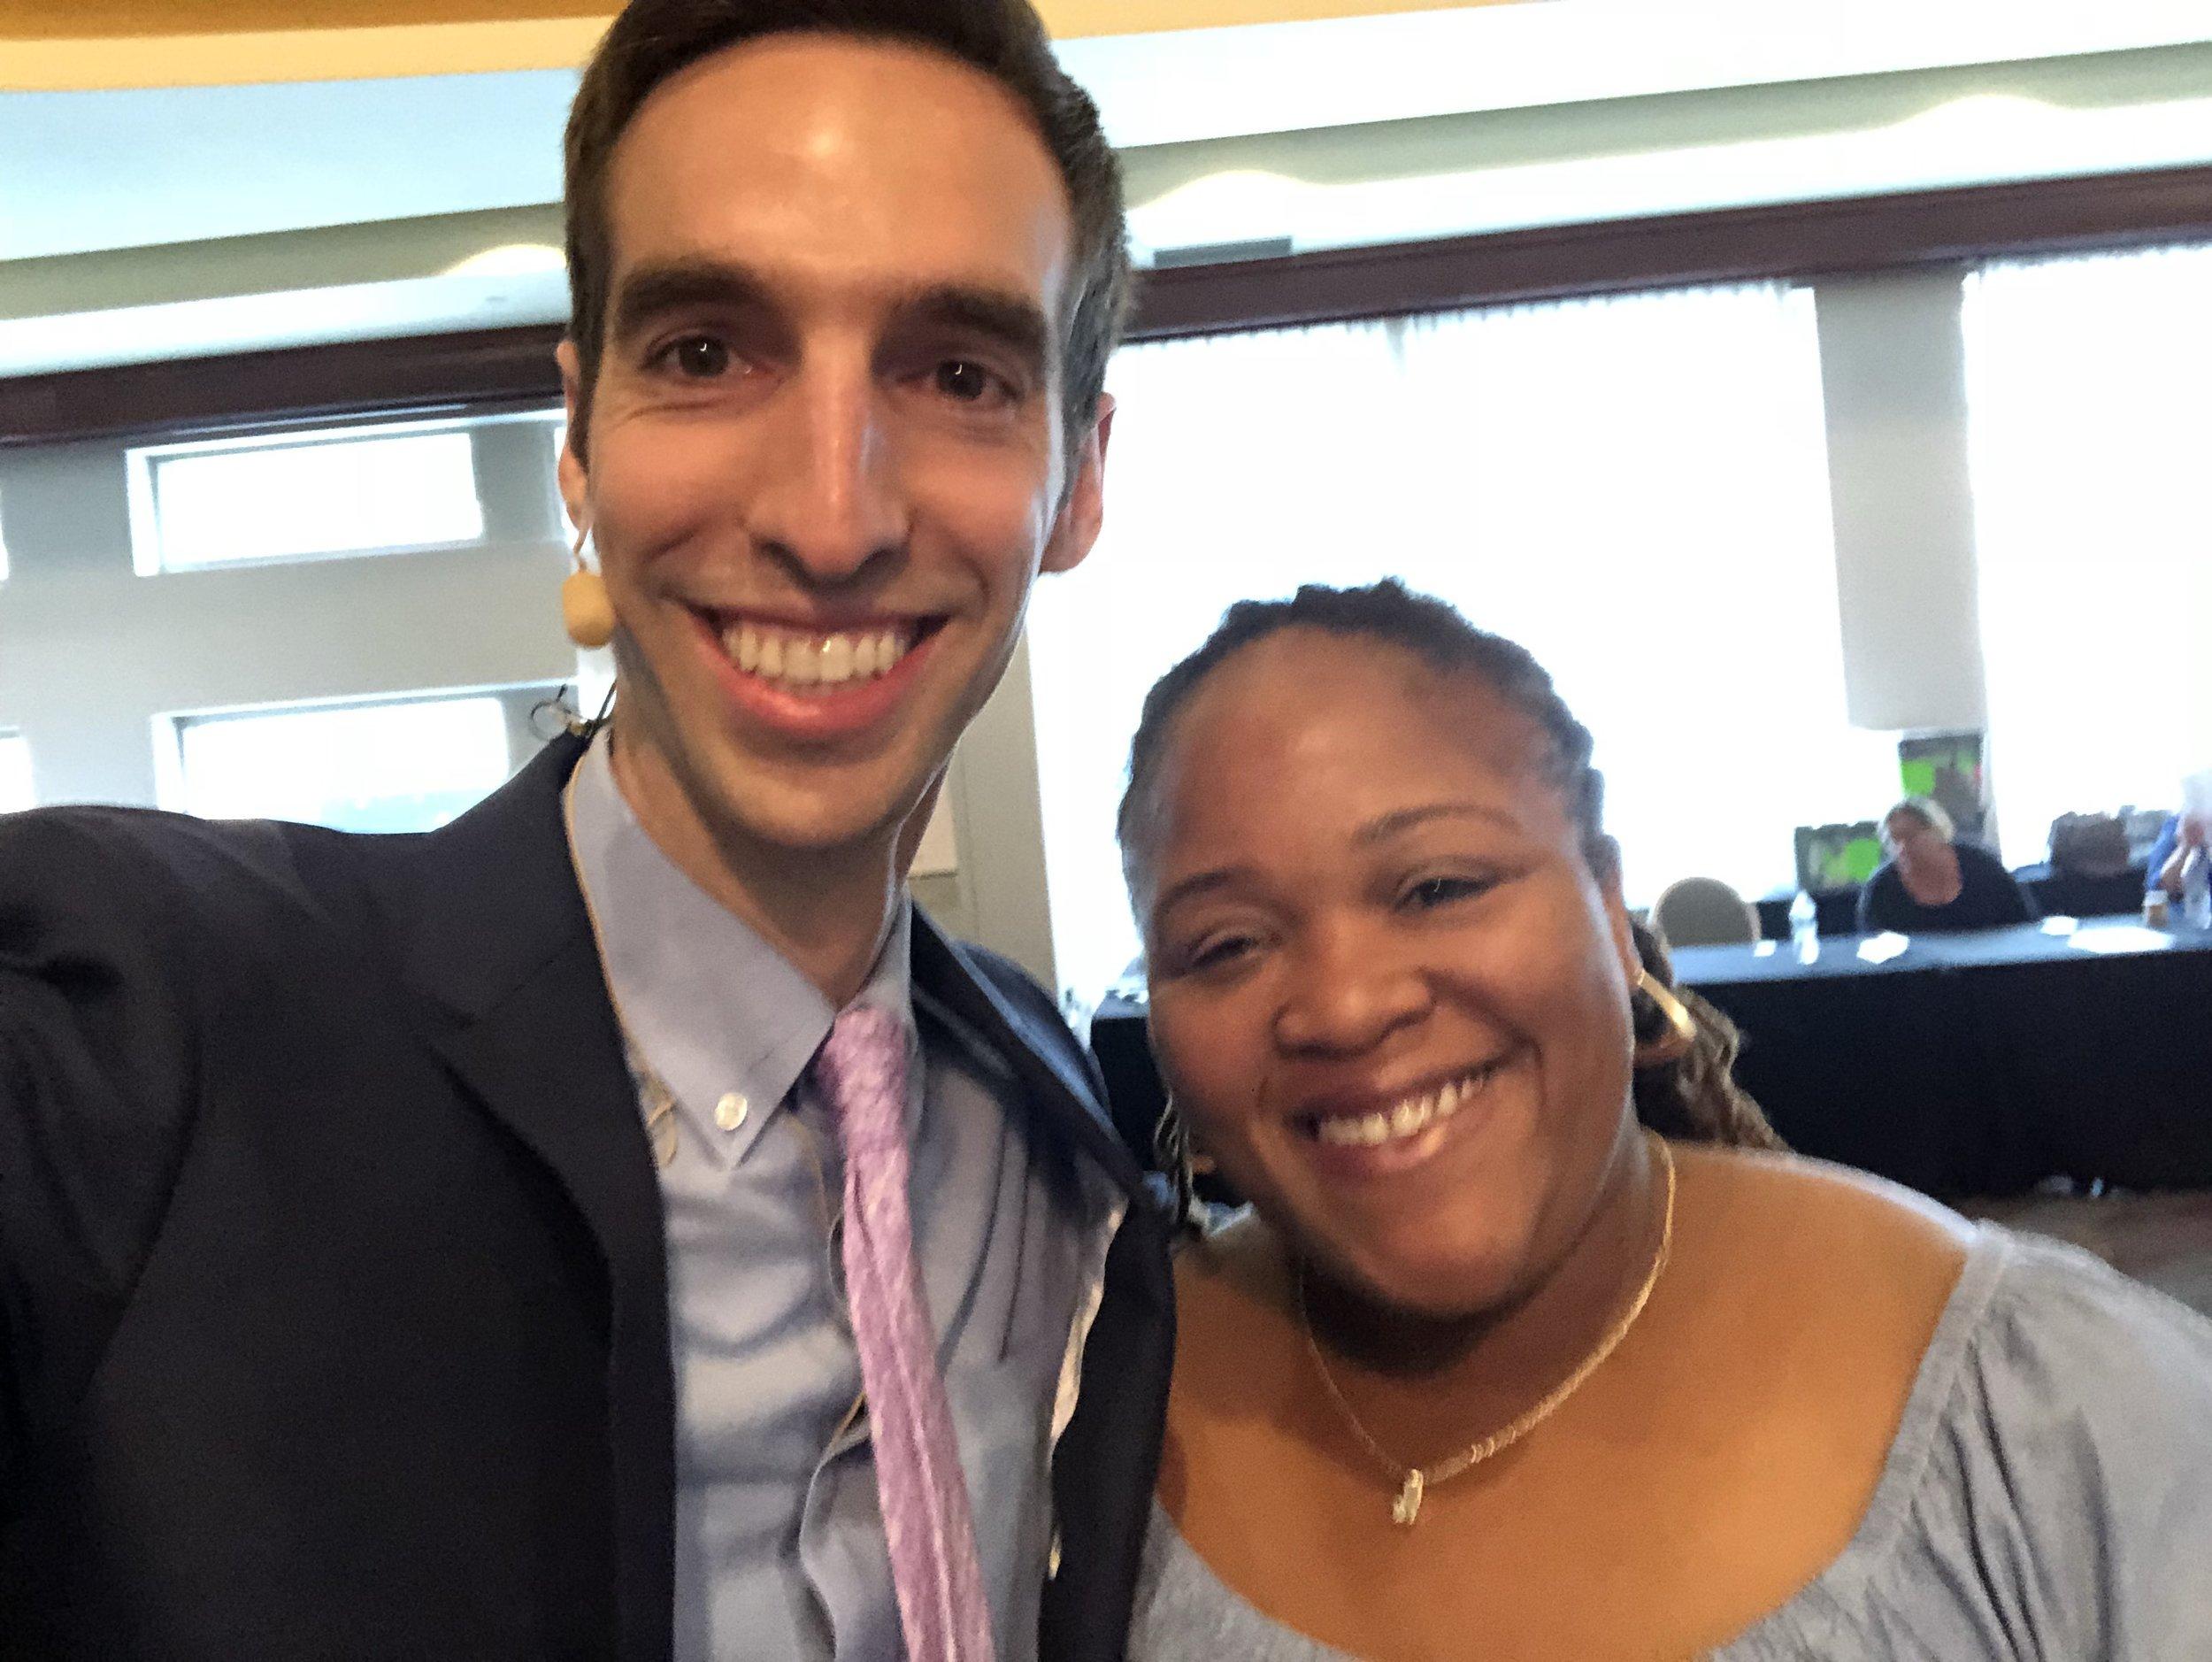 2018.07.15 AAFP DPC Summit 2018 Dr. Paul Thomas with Tamara Forbes from Anda Meds.jpg